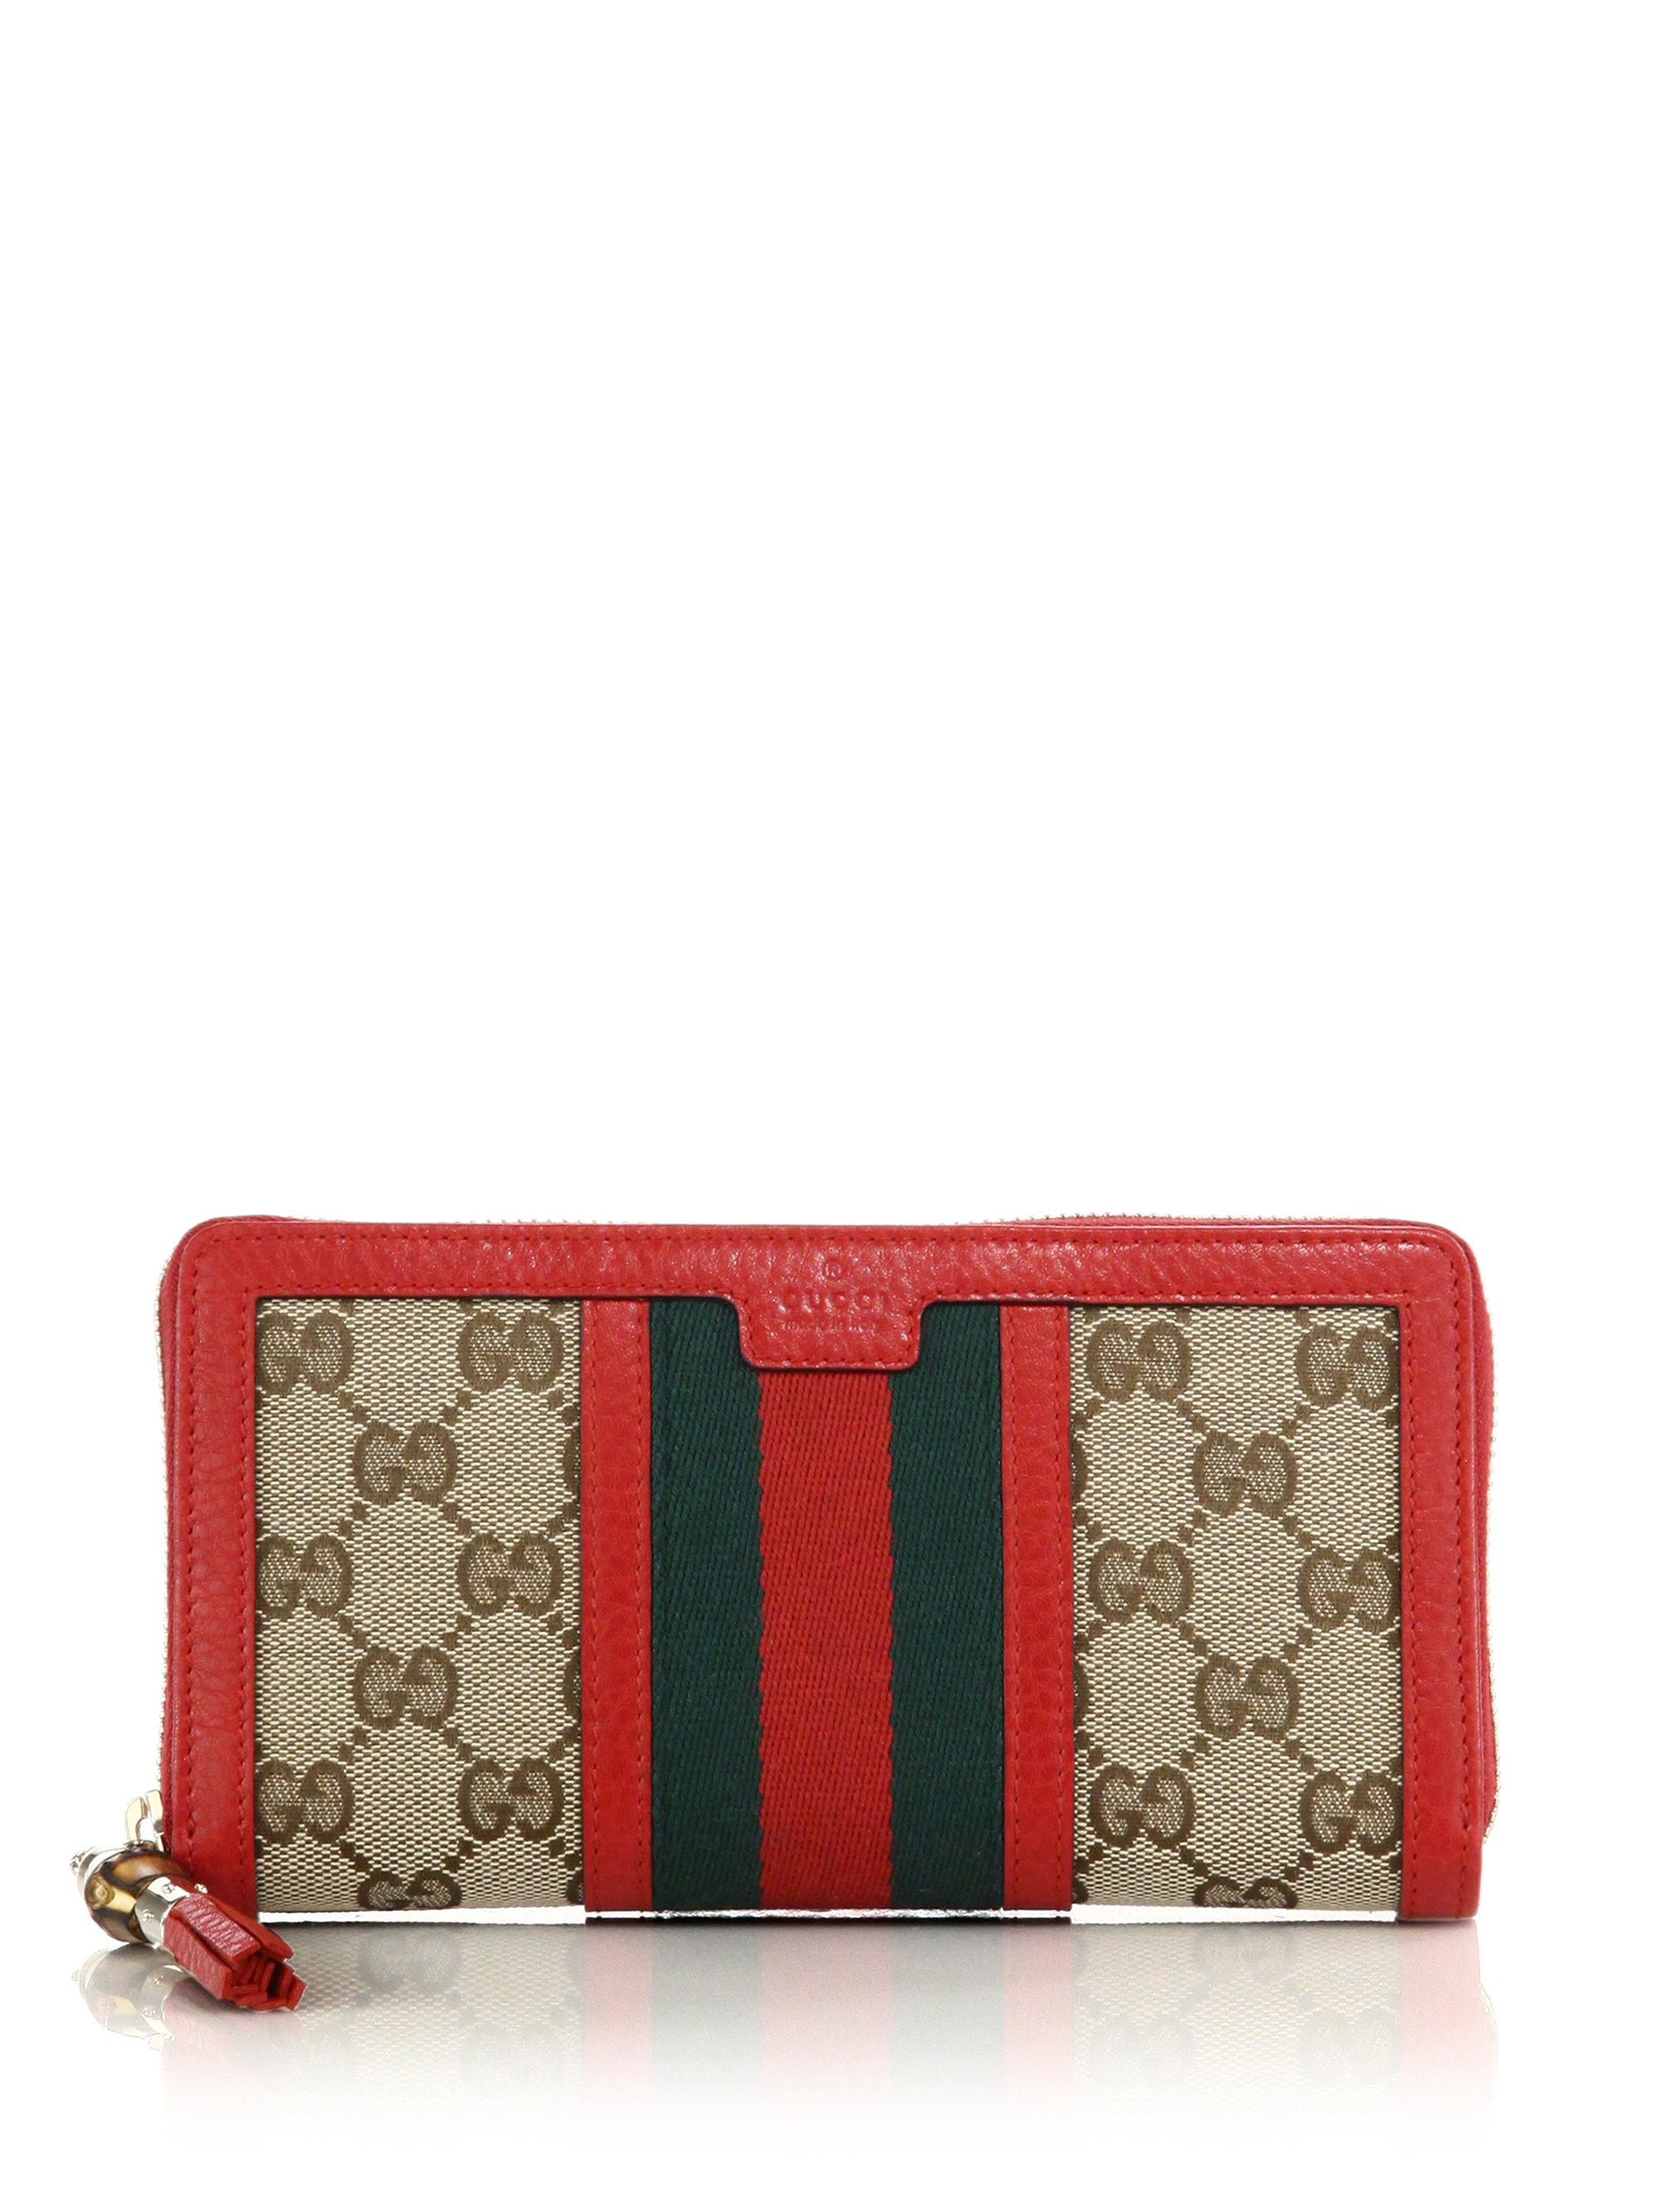 122f205280cd Gucci Rania Original Gg Canvas Zip-around Wallet in Red - Lyst